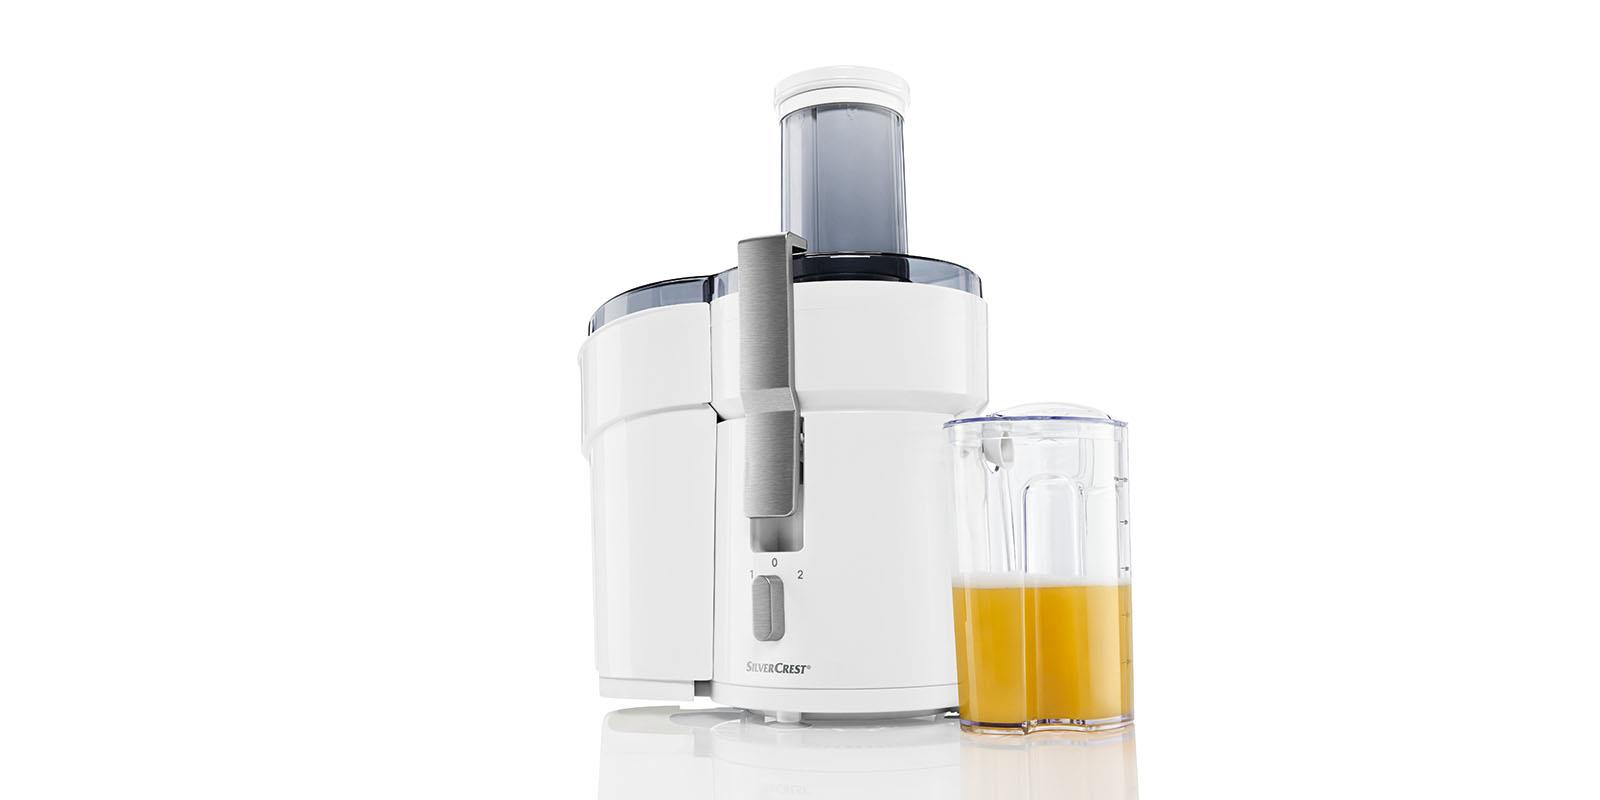 Slow Juicer Von Silvercrest : Entsafter Saftpresse Juicer SilverCrest weiss eBay